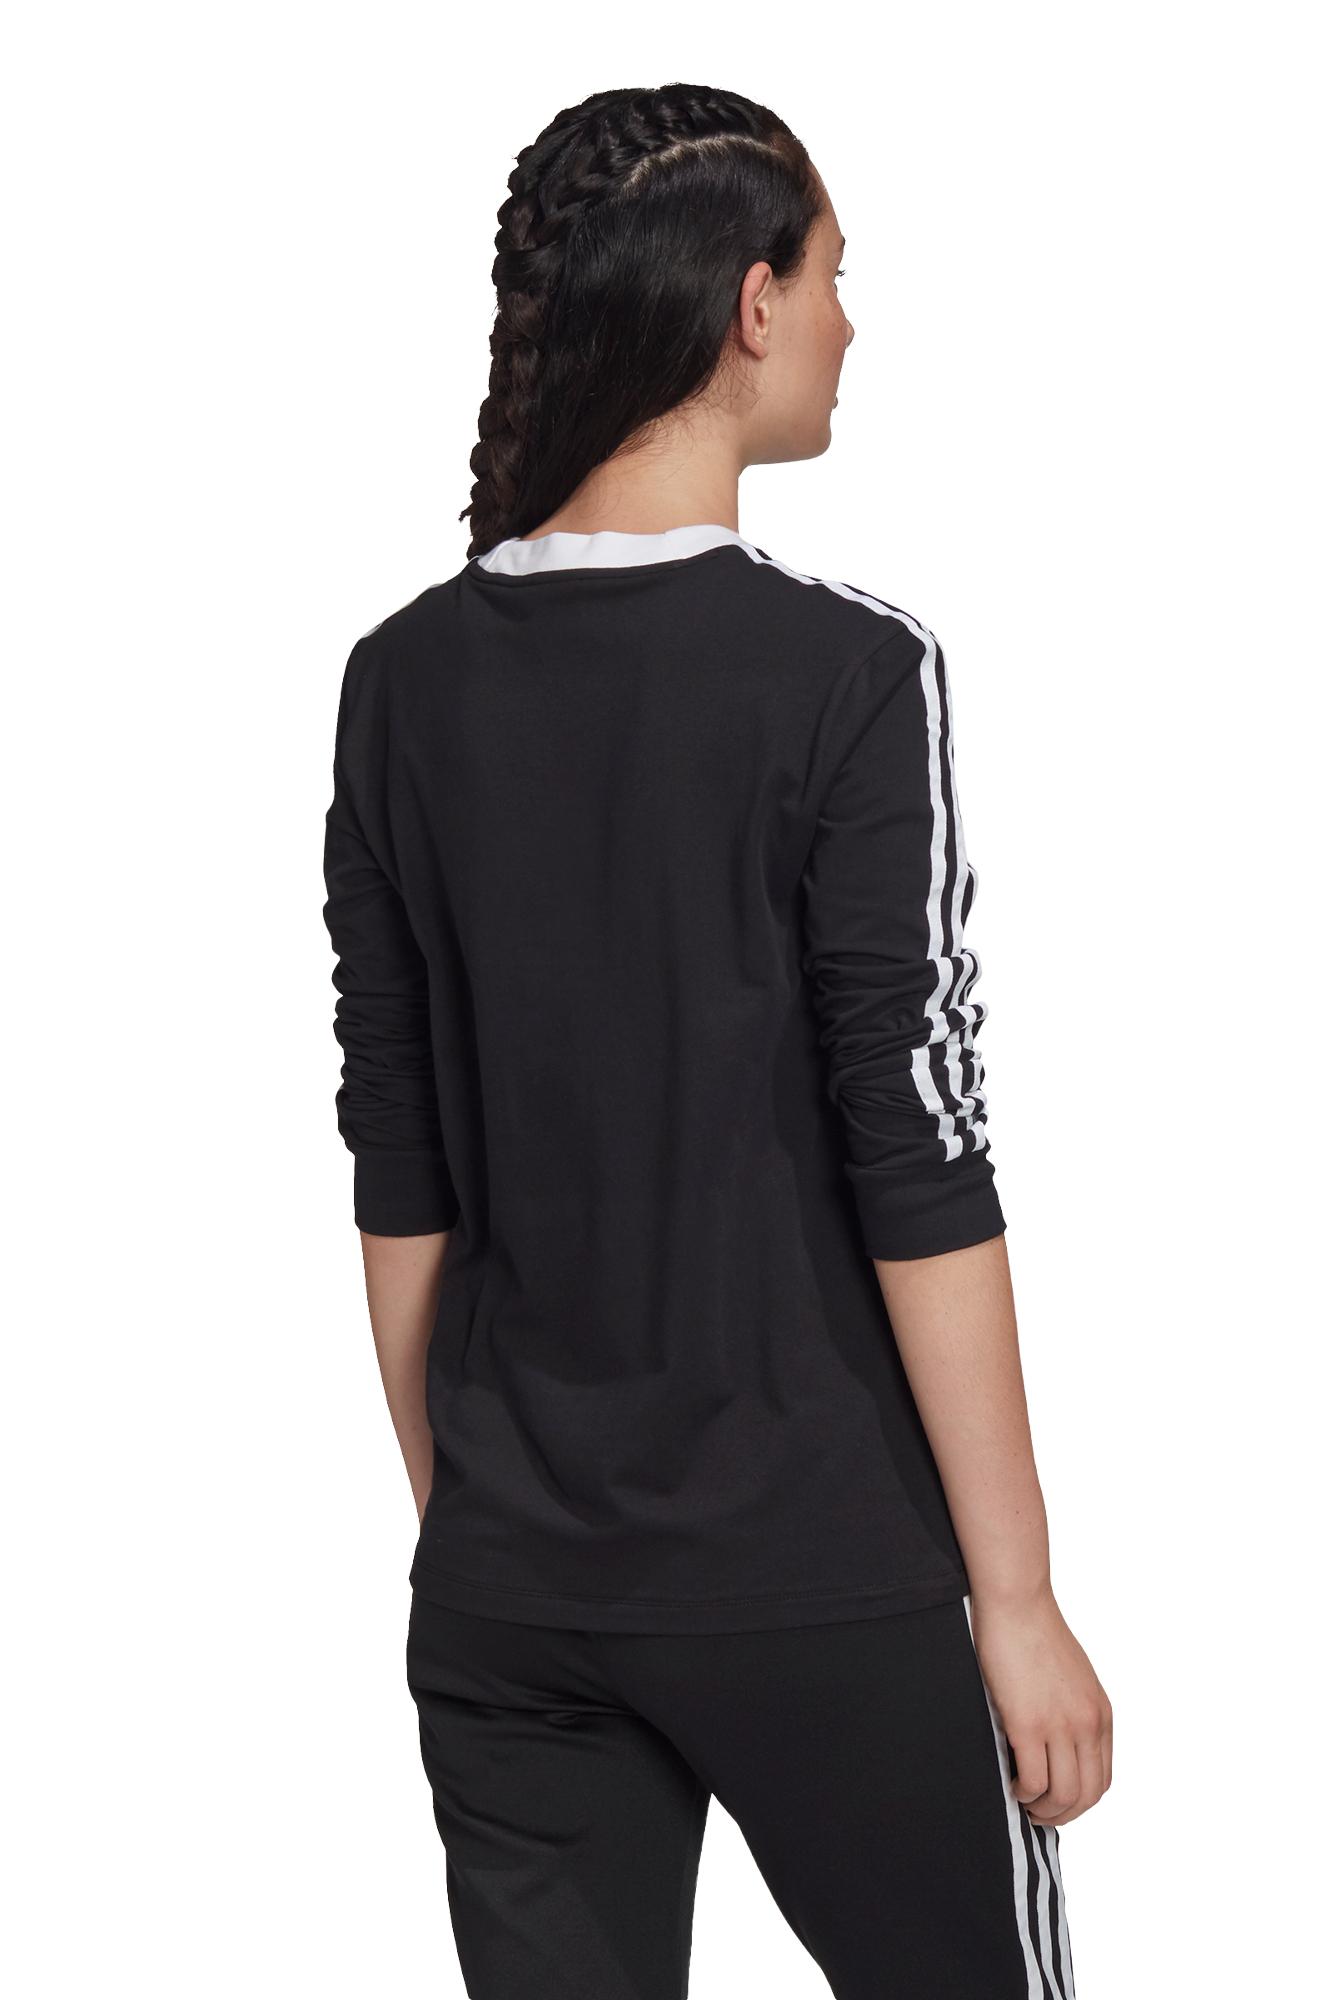 Longsleeve adidas Originals 3 Stripes FM3301 Longsleeve